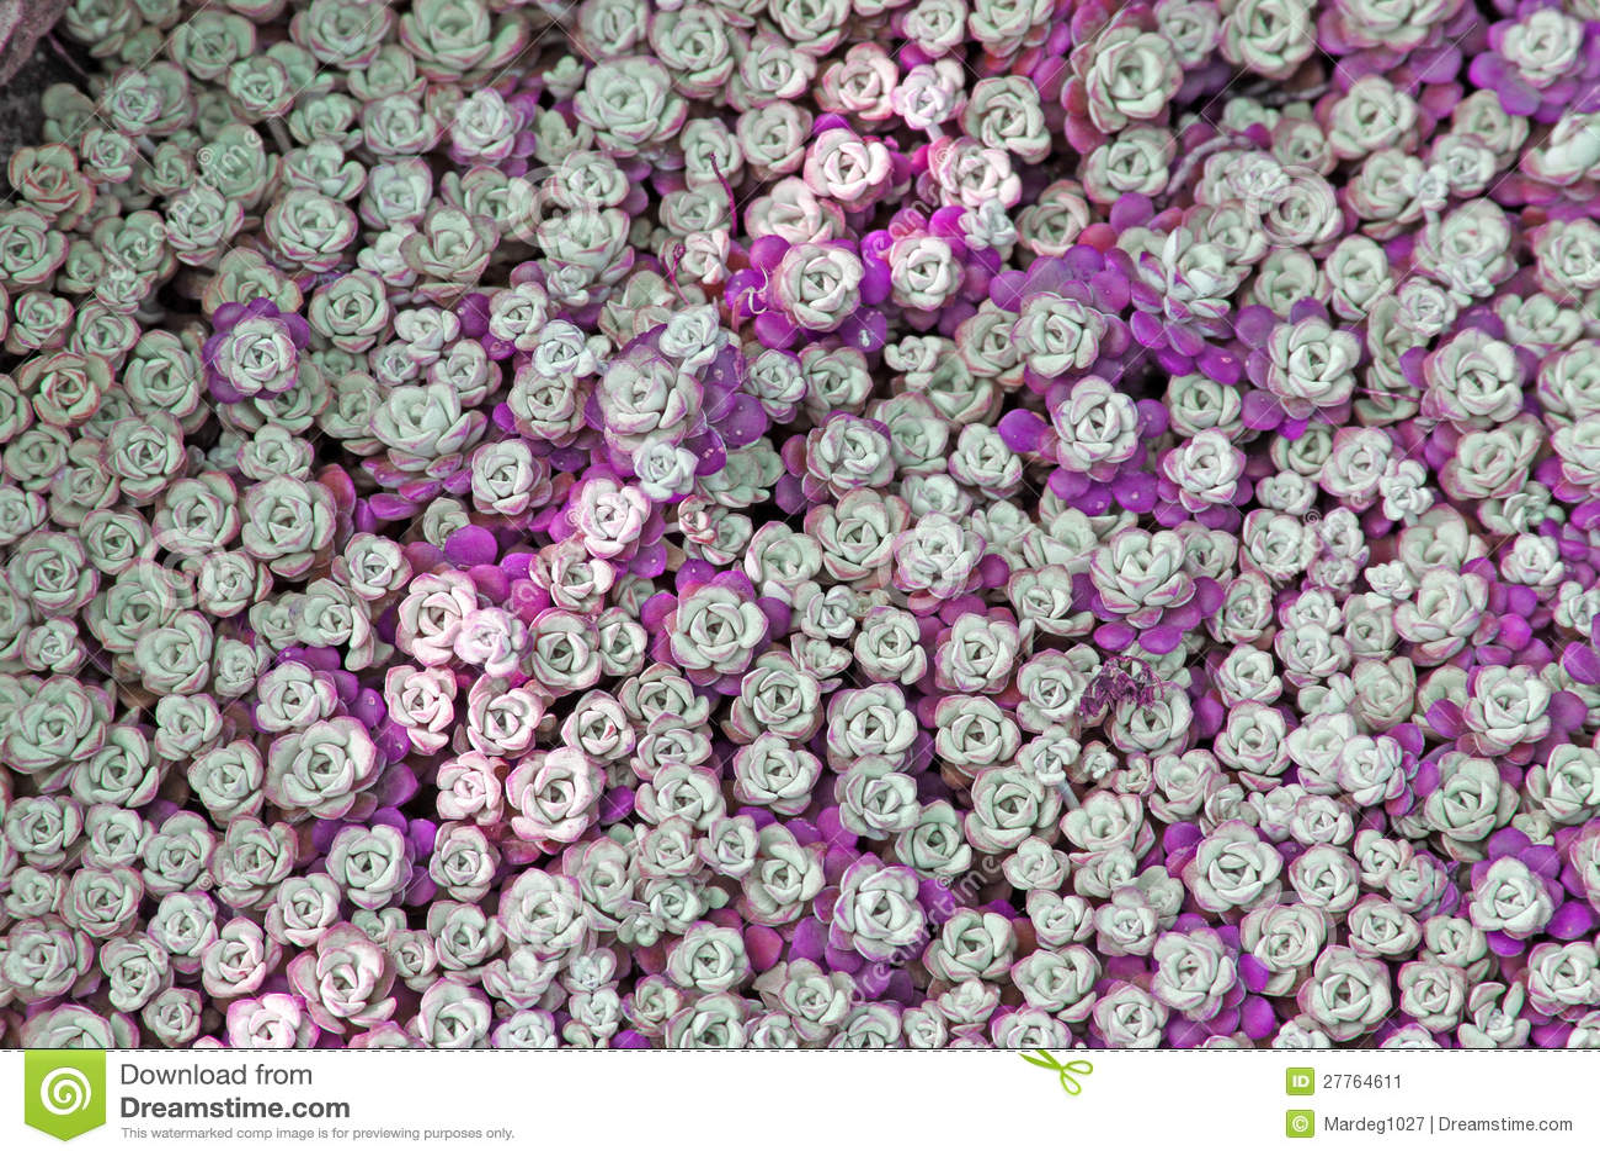 Violette d orpin